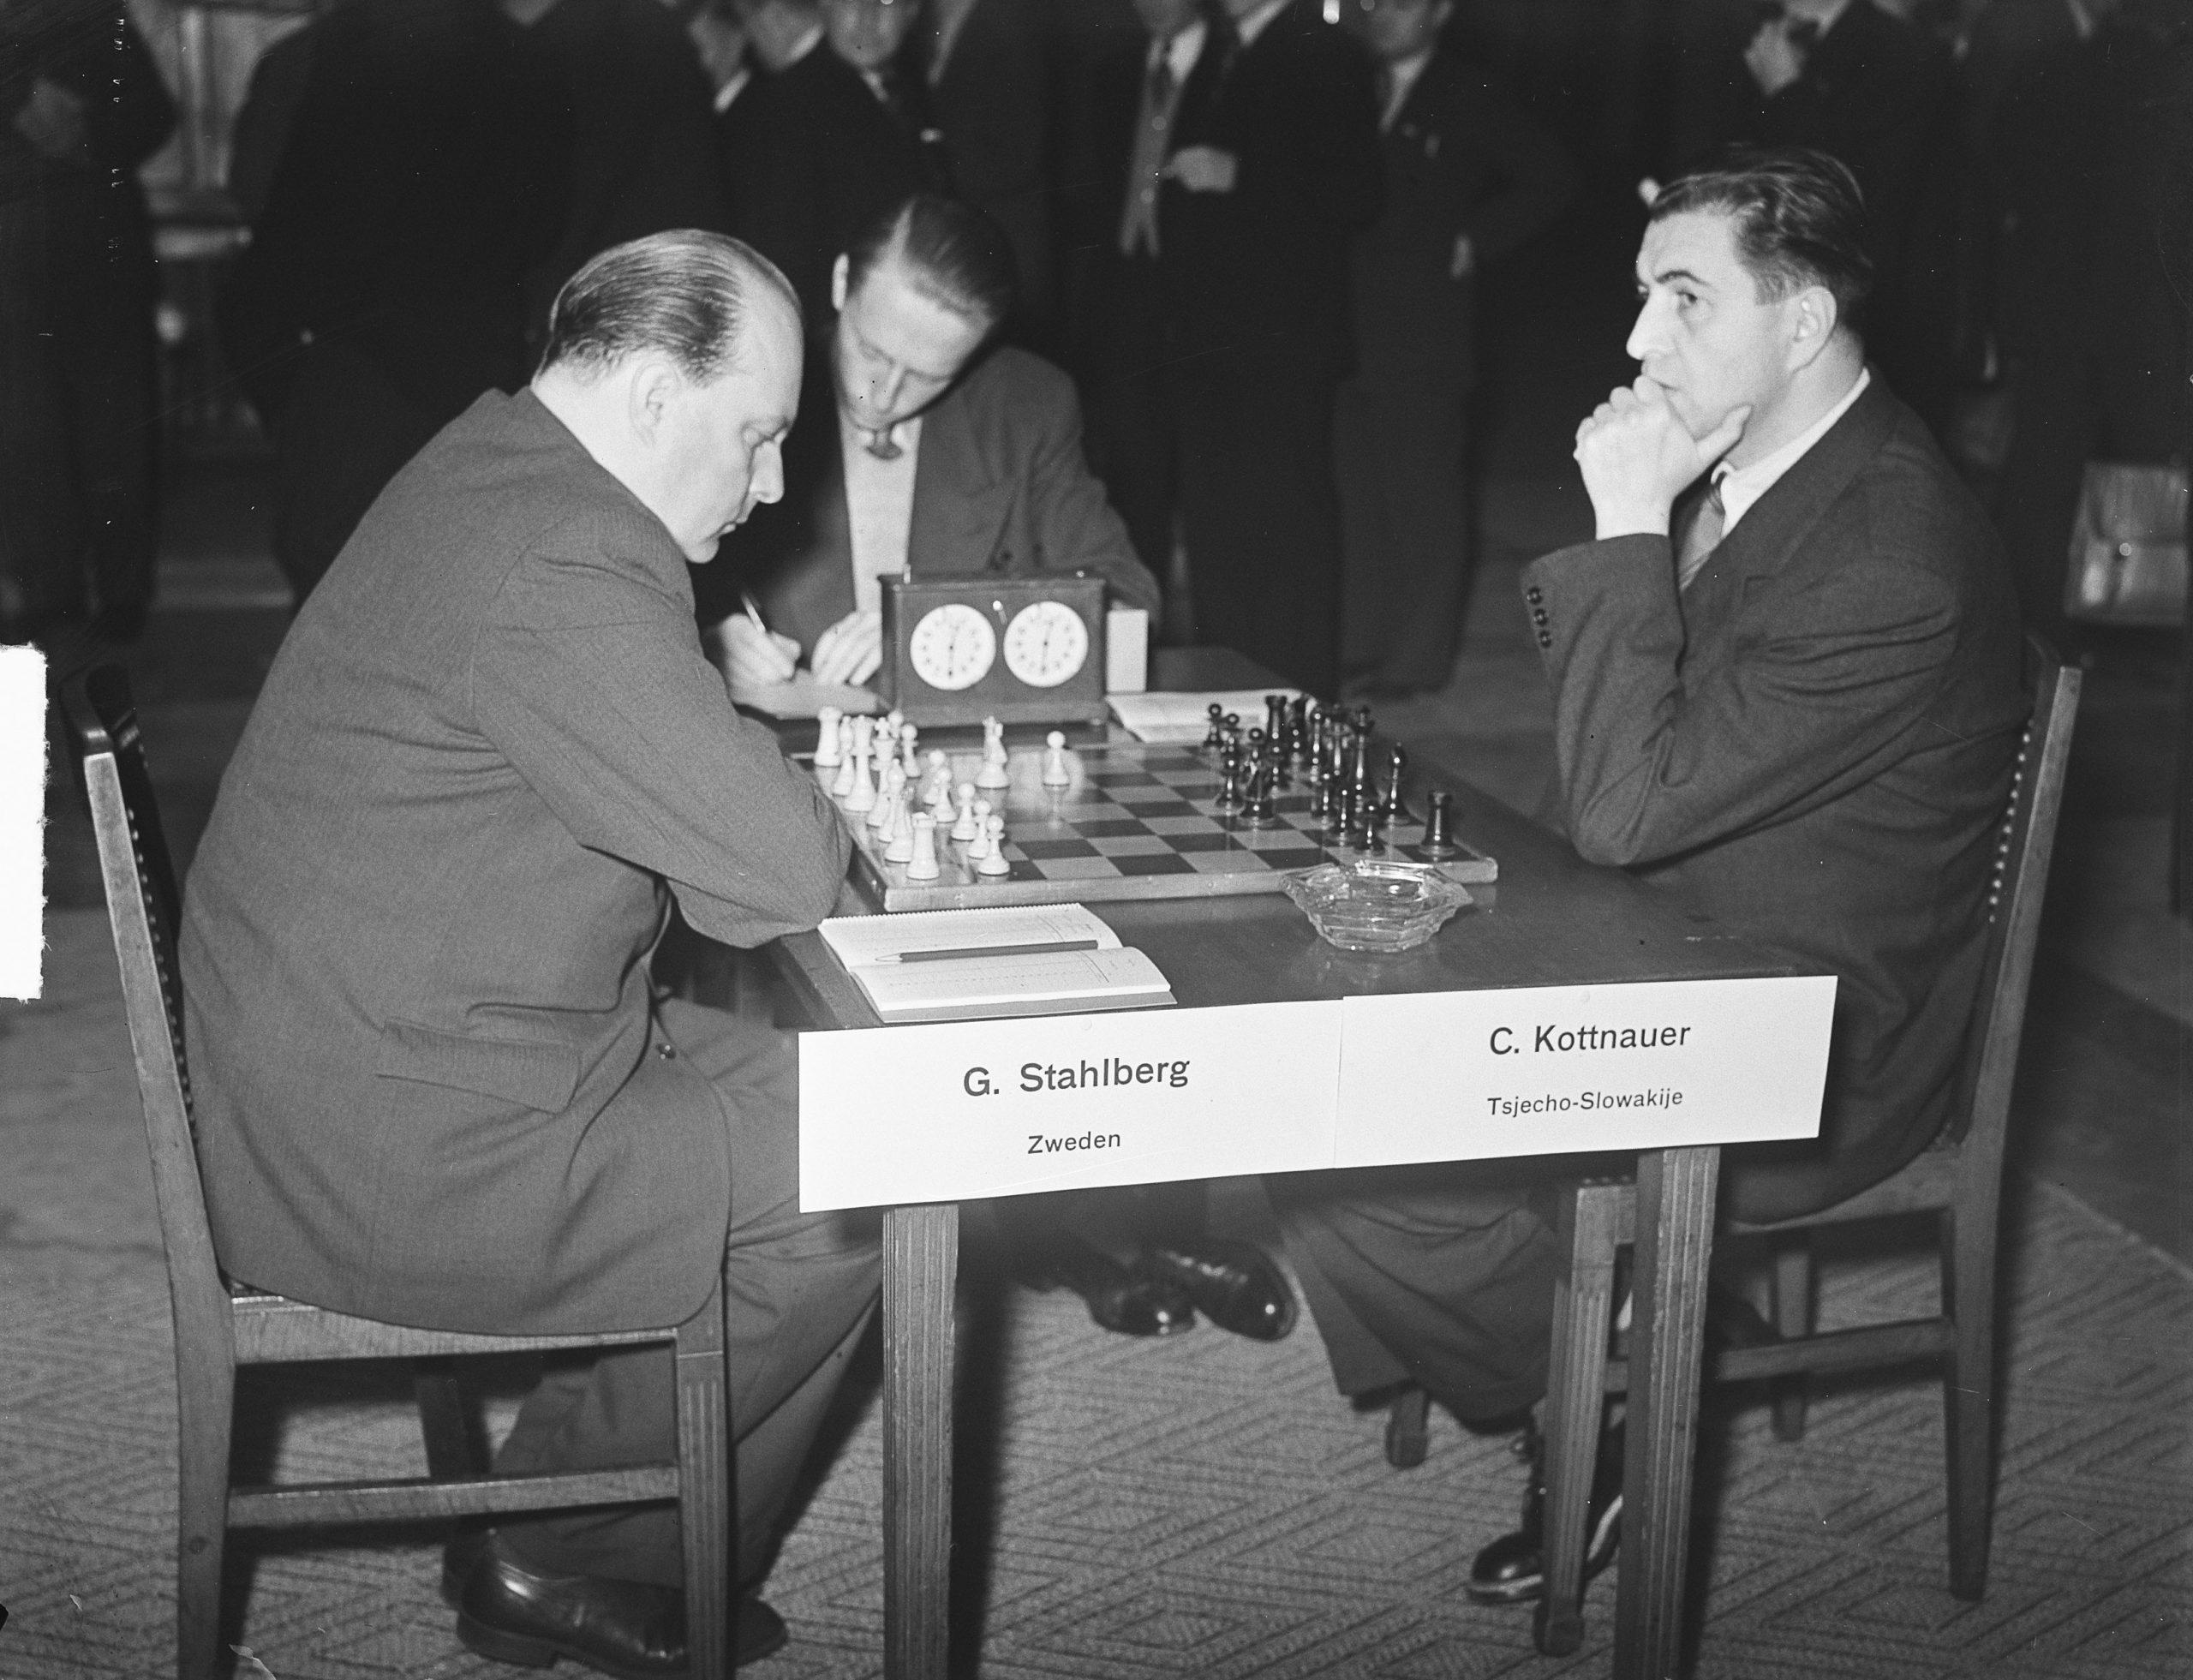 Amsterdam 1950, first day; Gideon Stahlberg versus Cenek Kottnauer Date: November 11, 1950